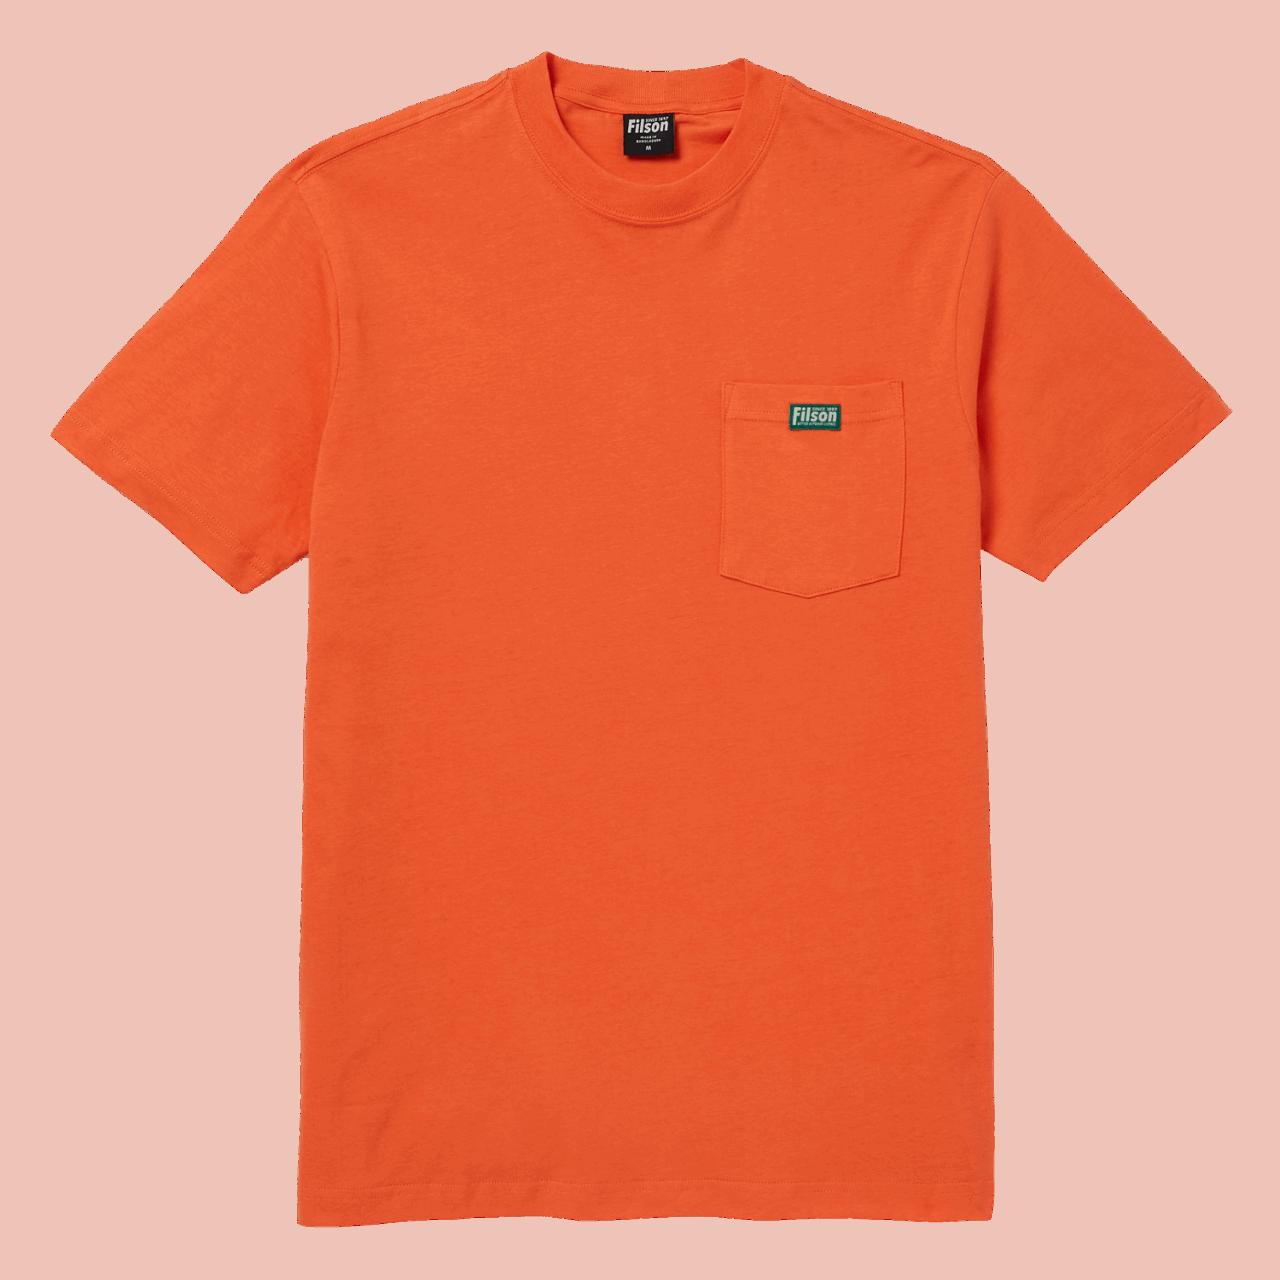 Filson Ranger Solid One Pocket T-Shirt - blaze orange